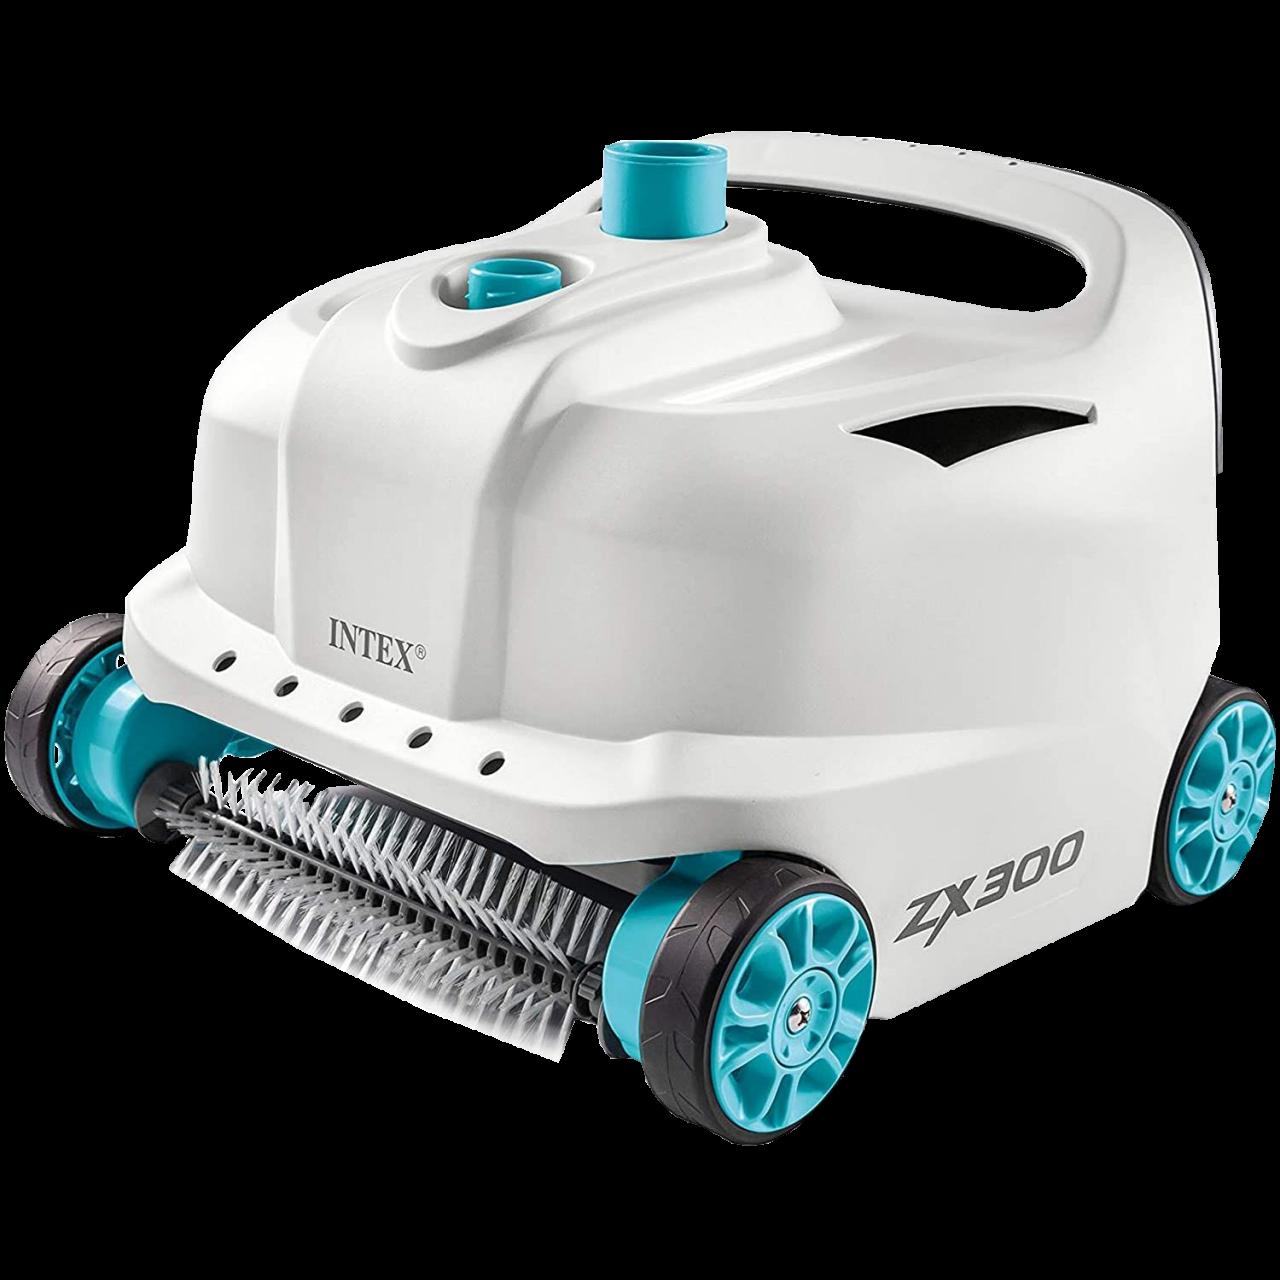 Intex 28005 Deluxe Auto Pool Cleaner ZX300 Poolroboter Bodensauger Poolreiniger